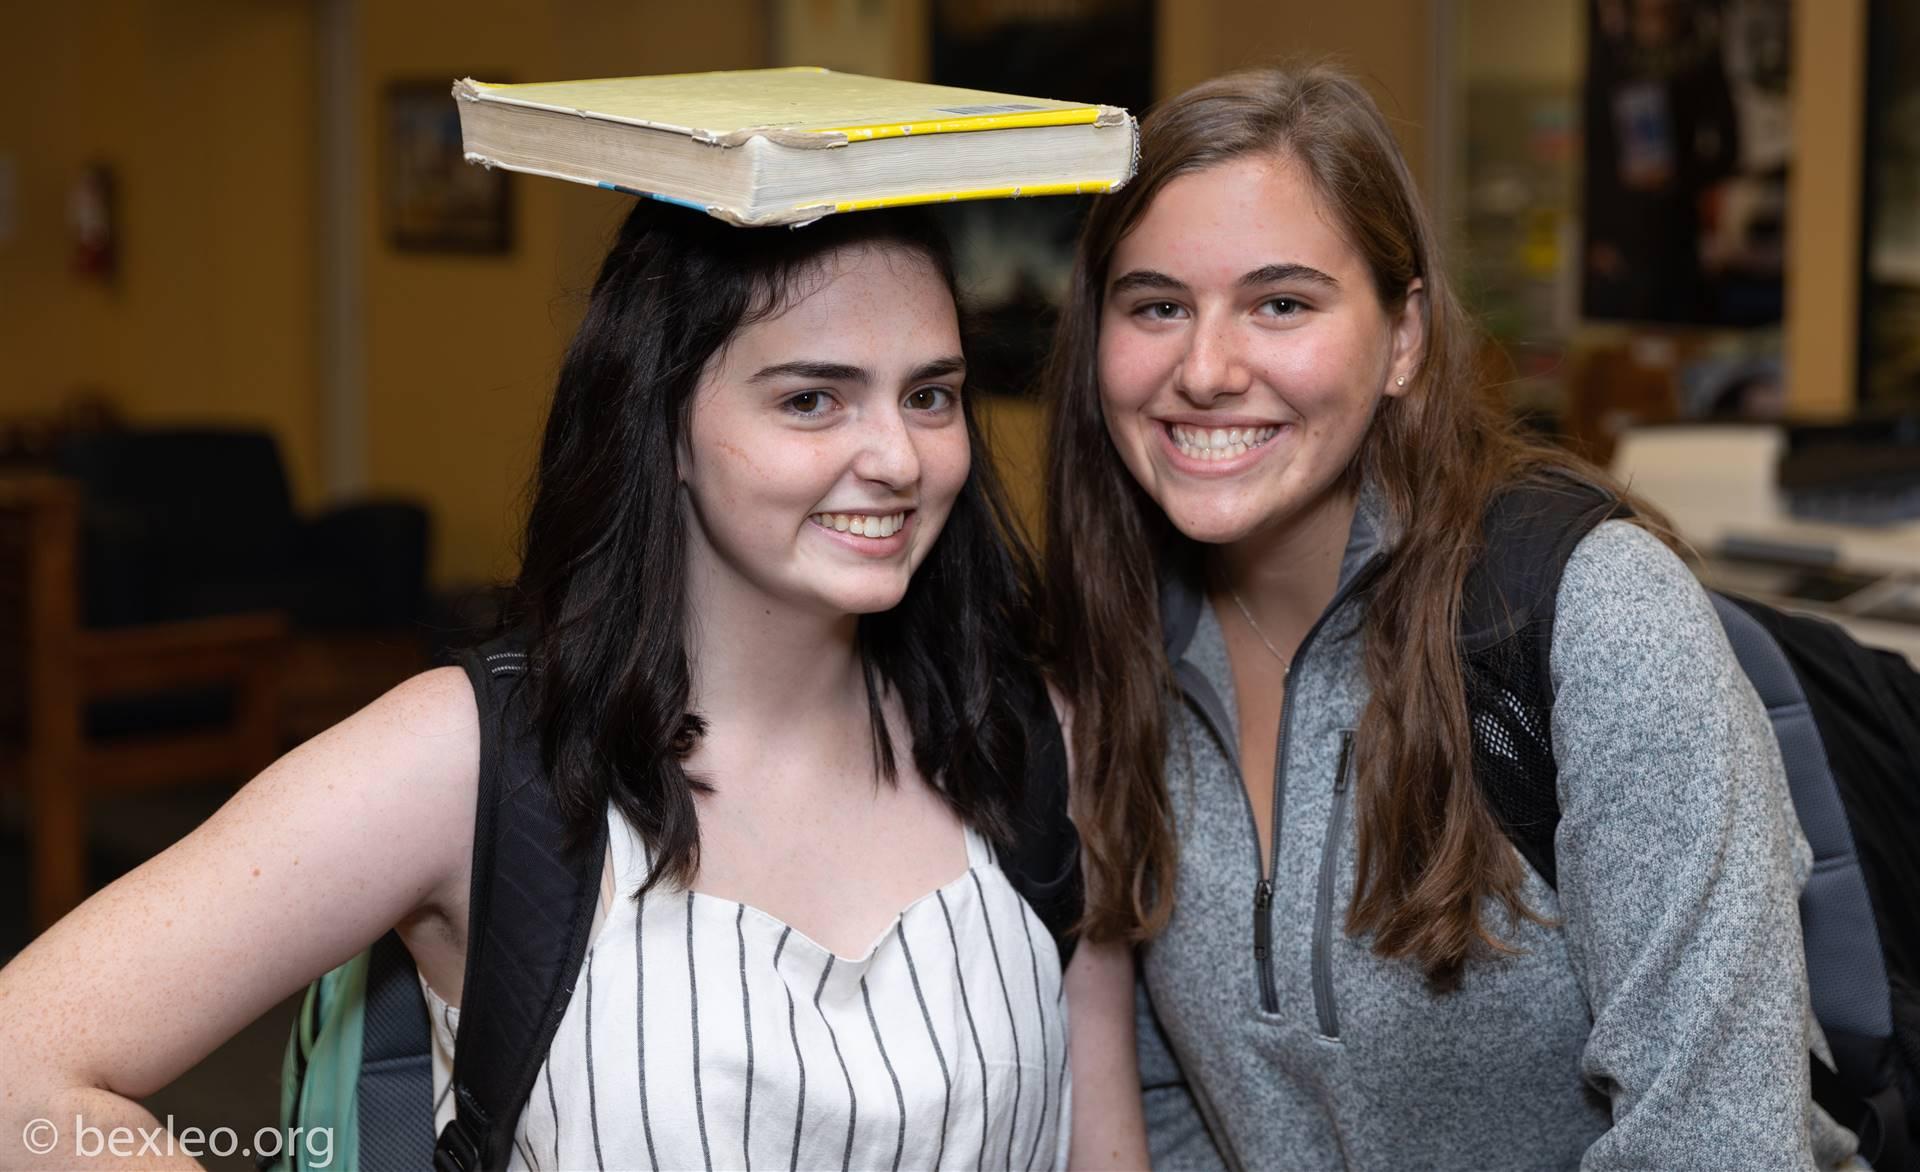 A math student balances her calculus textbook on her head next to a friend